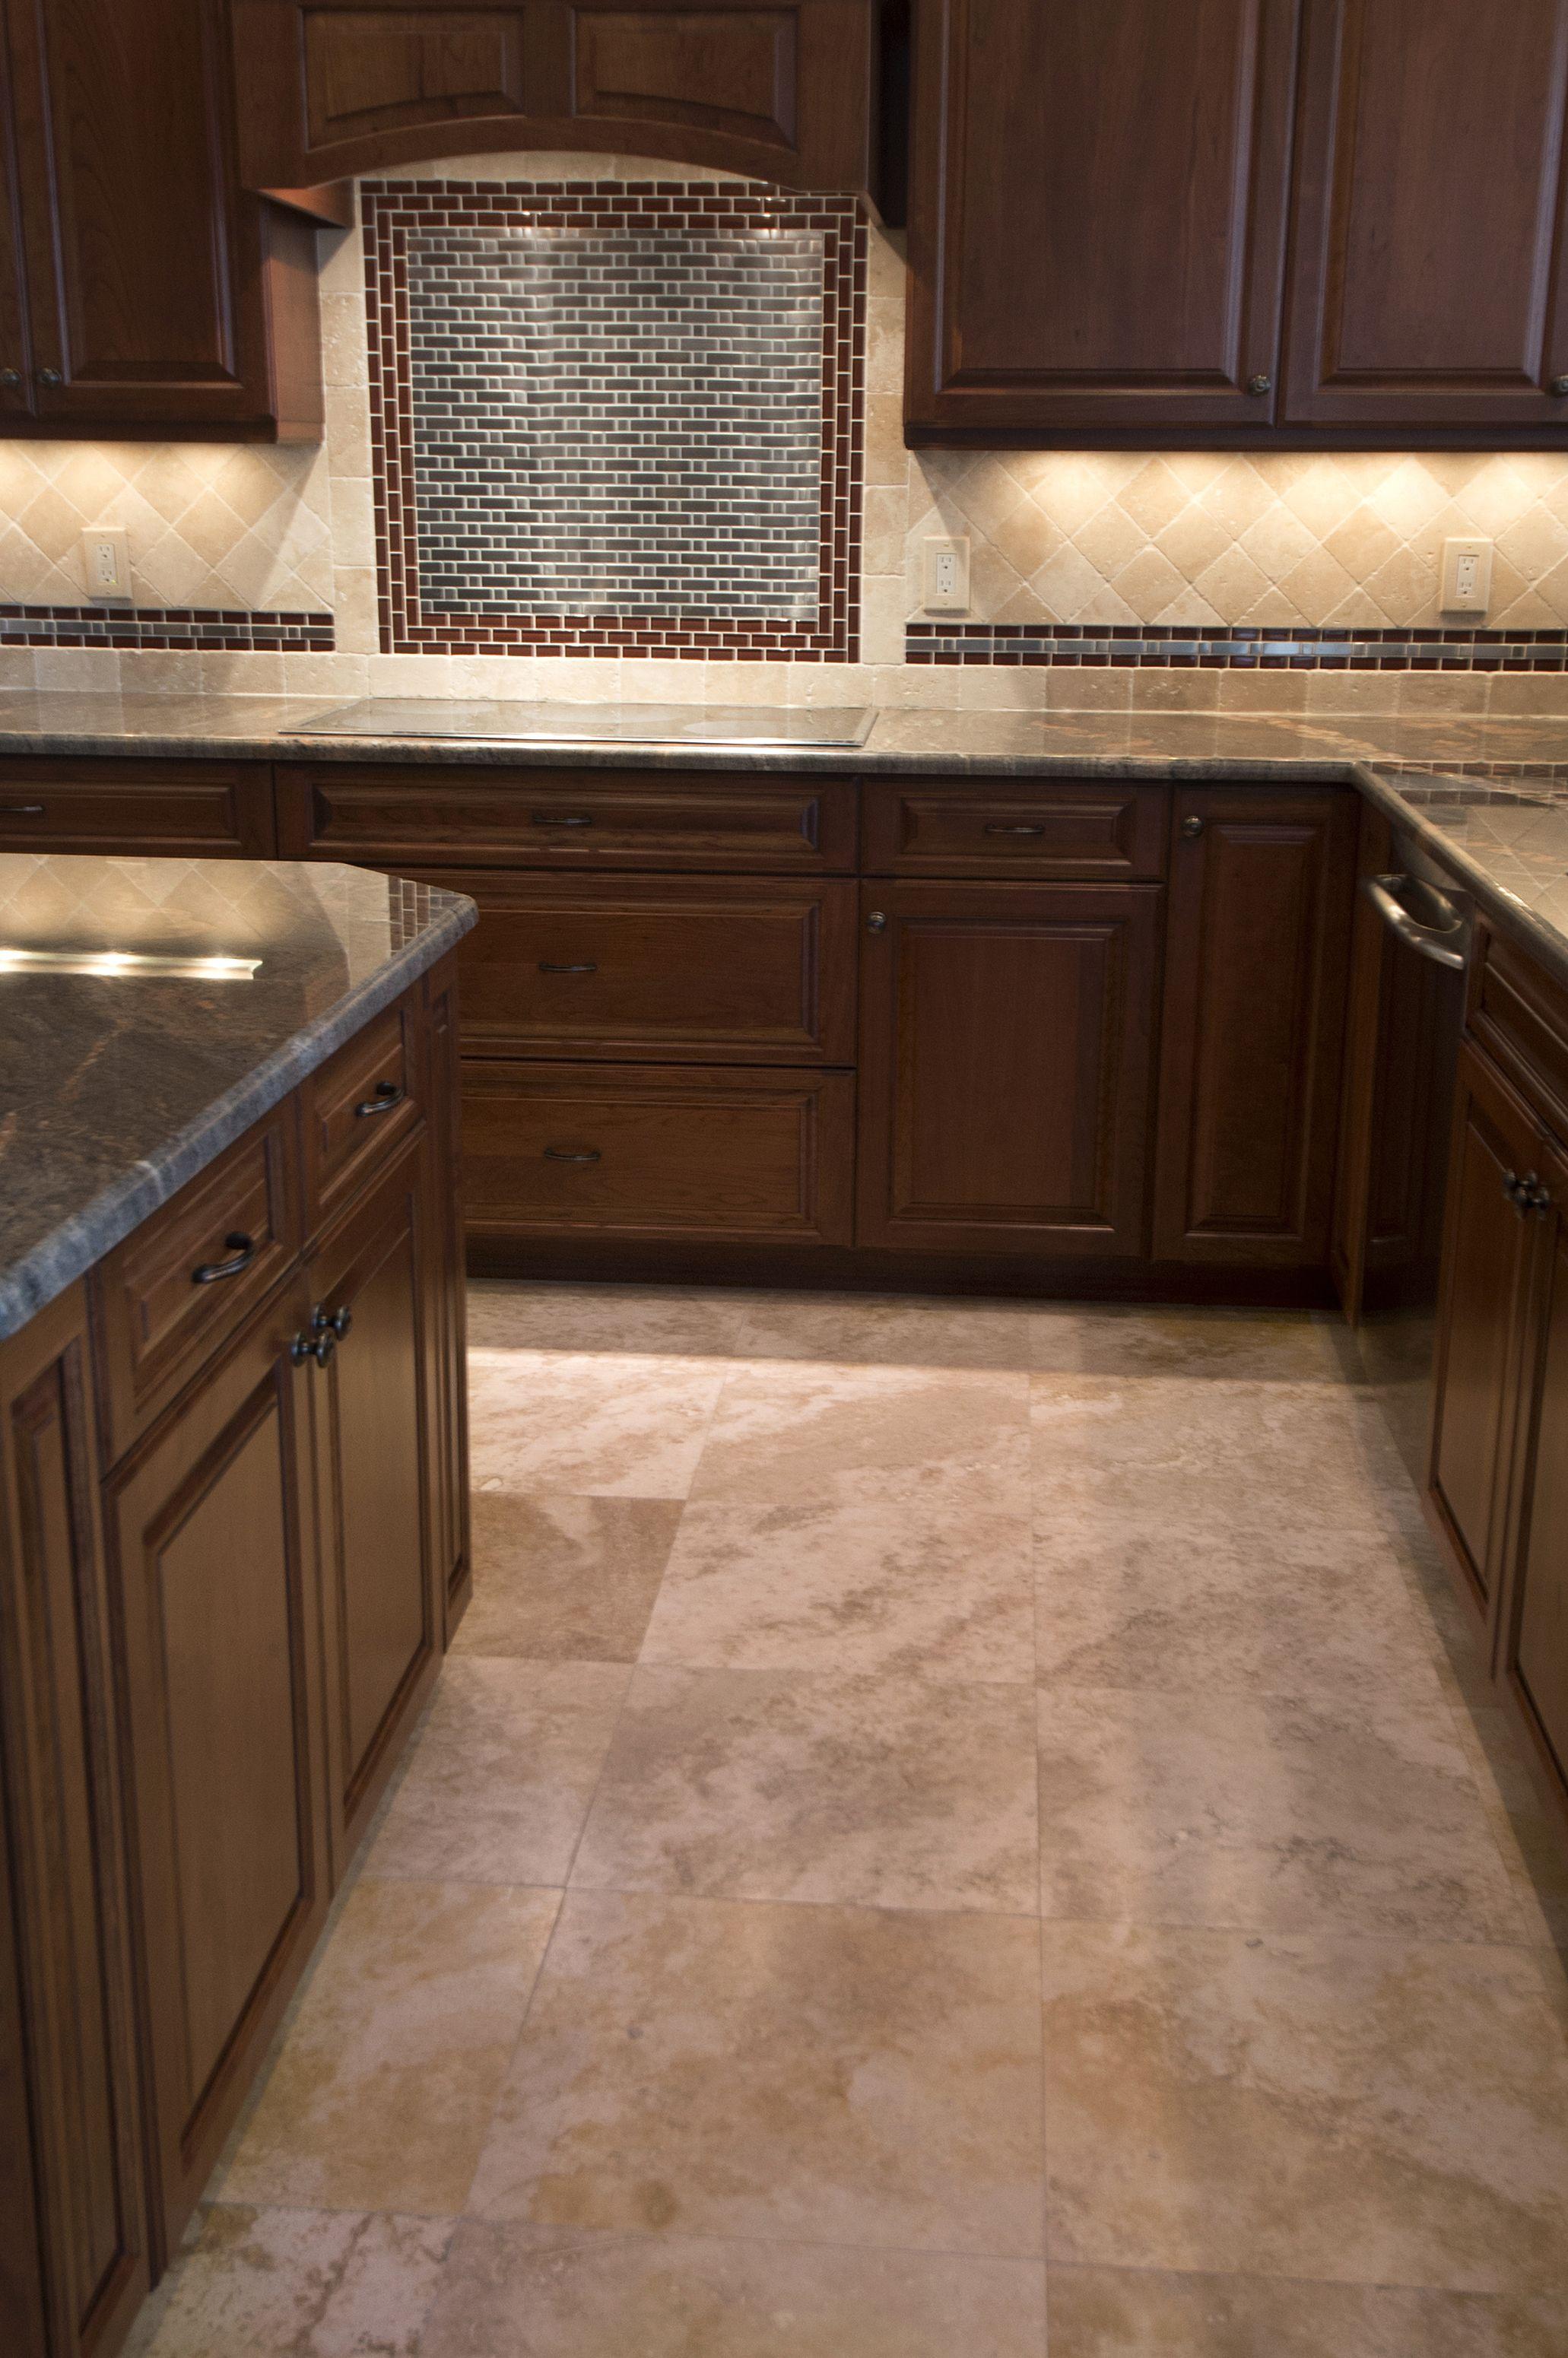 Stone Kitchen In Fort Myers Fl Jocelyn Snider Kitchen Stone Kitchen Kitchen Cabinets